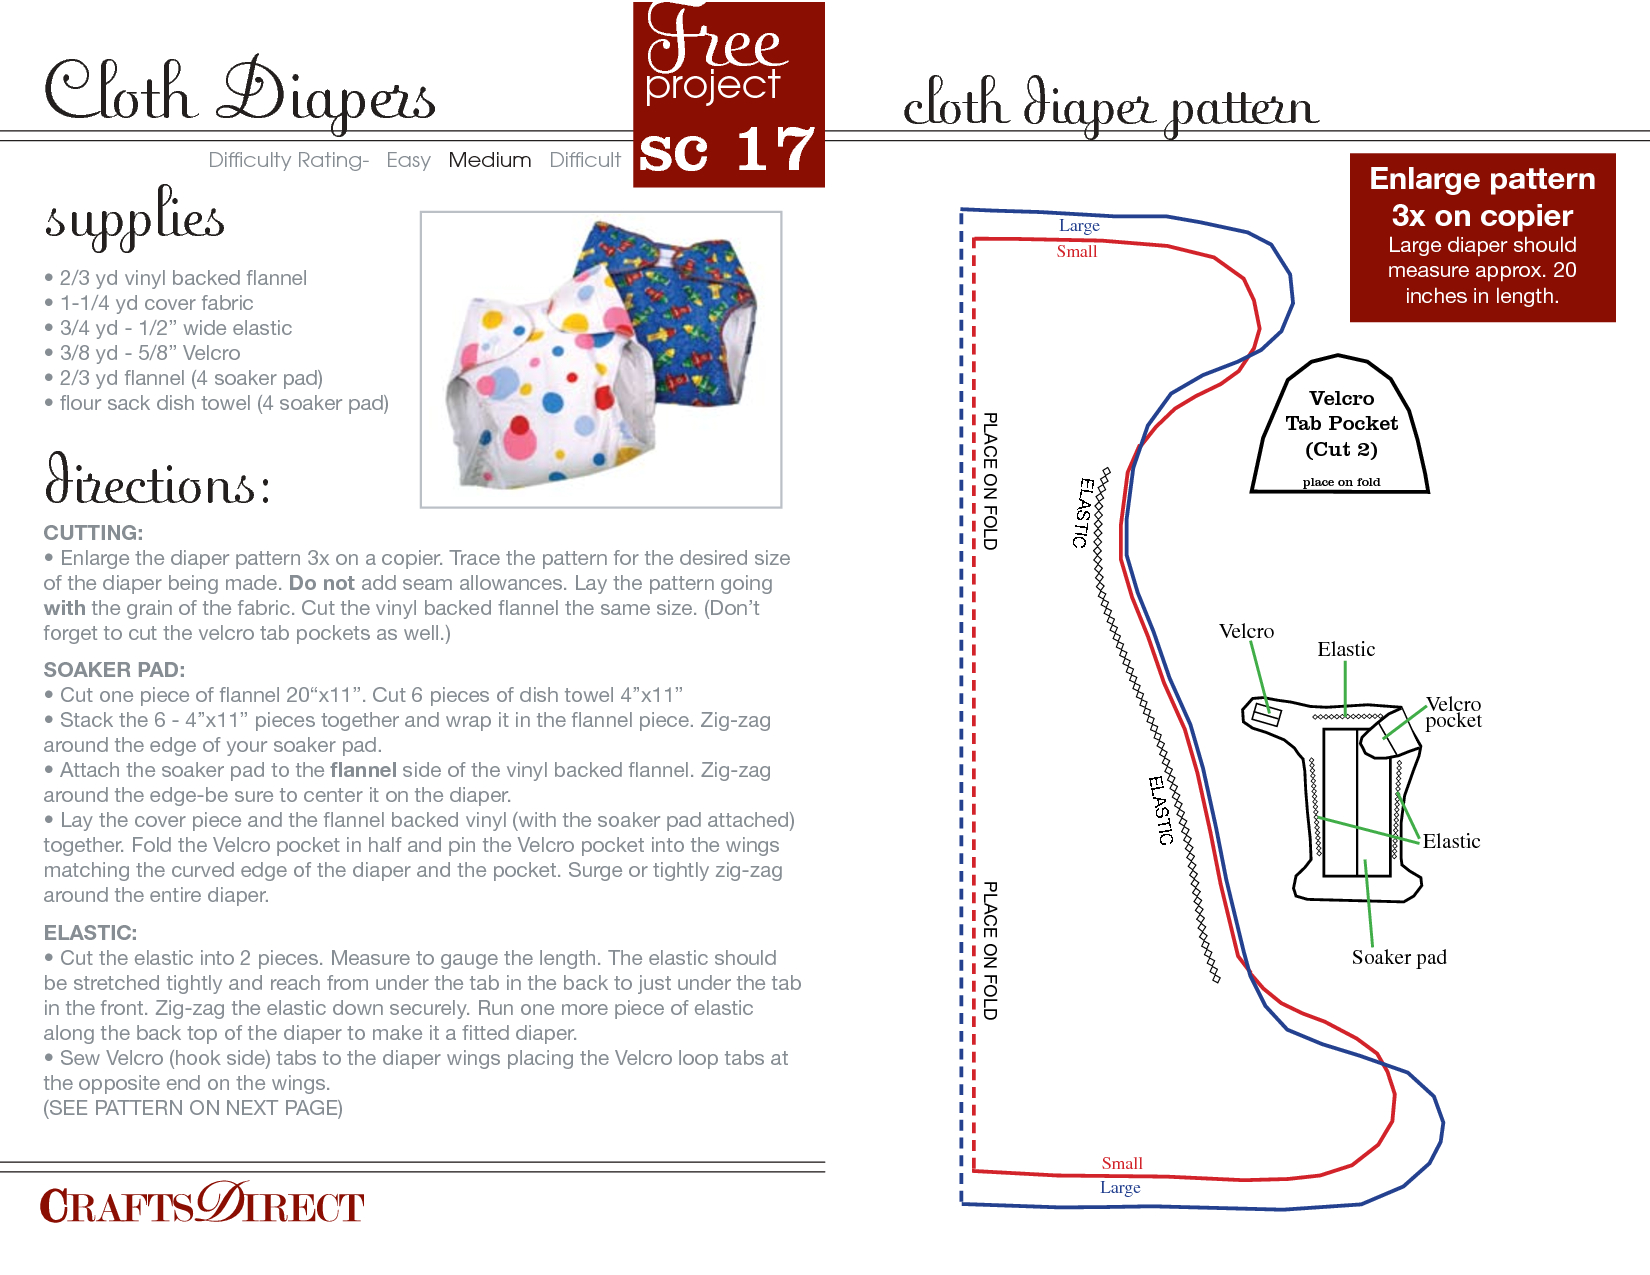 Free Cloth Diaper Patterns | Cloth Diaper Pattern_My Free Diaper - Cloth Diaper Pattern Free Printable